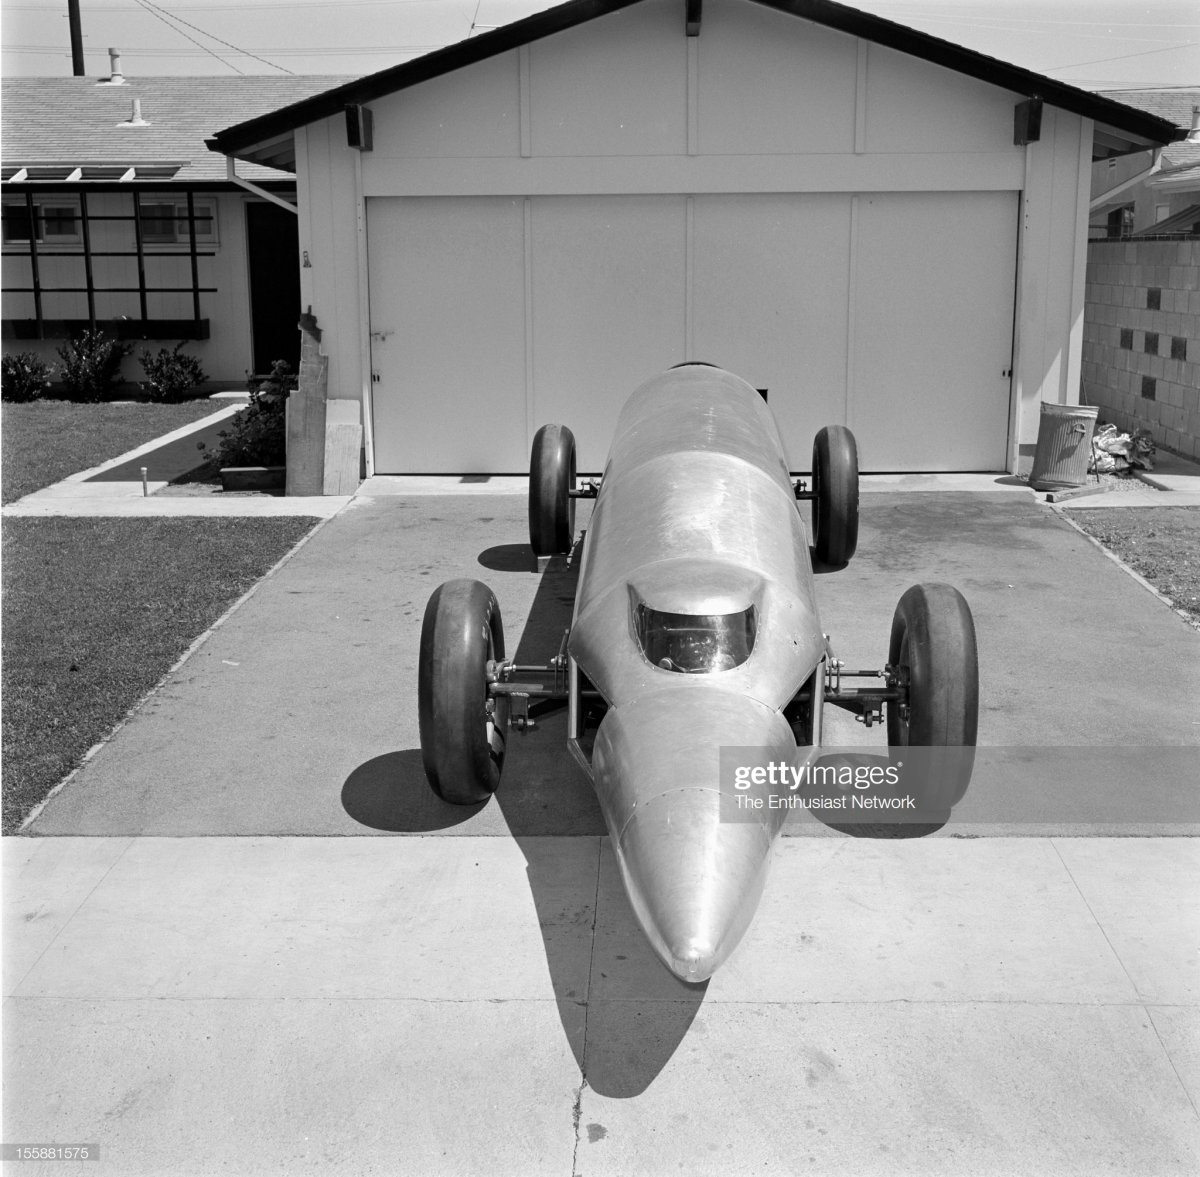 74 Bill Fredrick Valkyrie Jet Car2.jpg